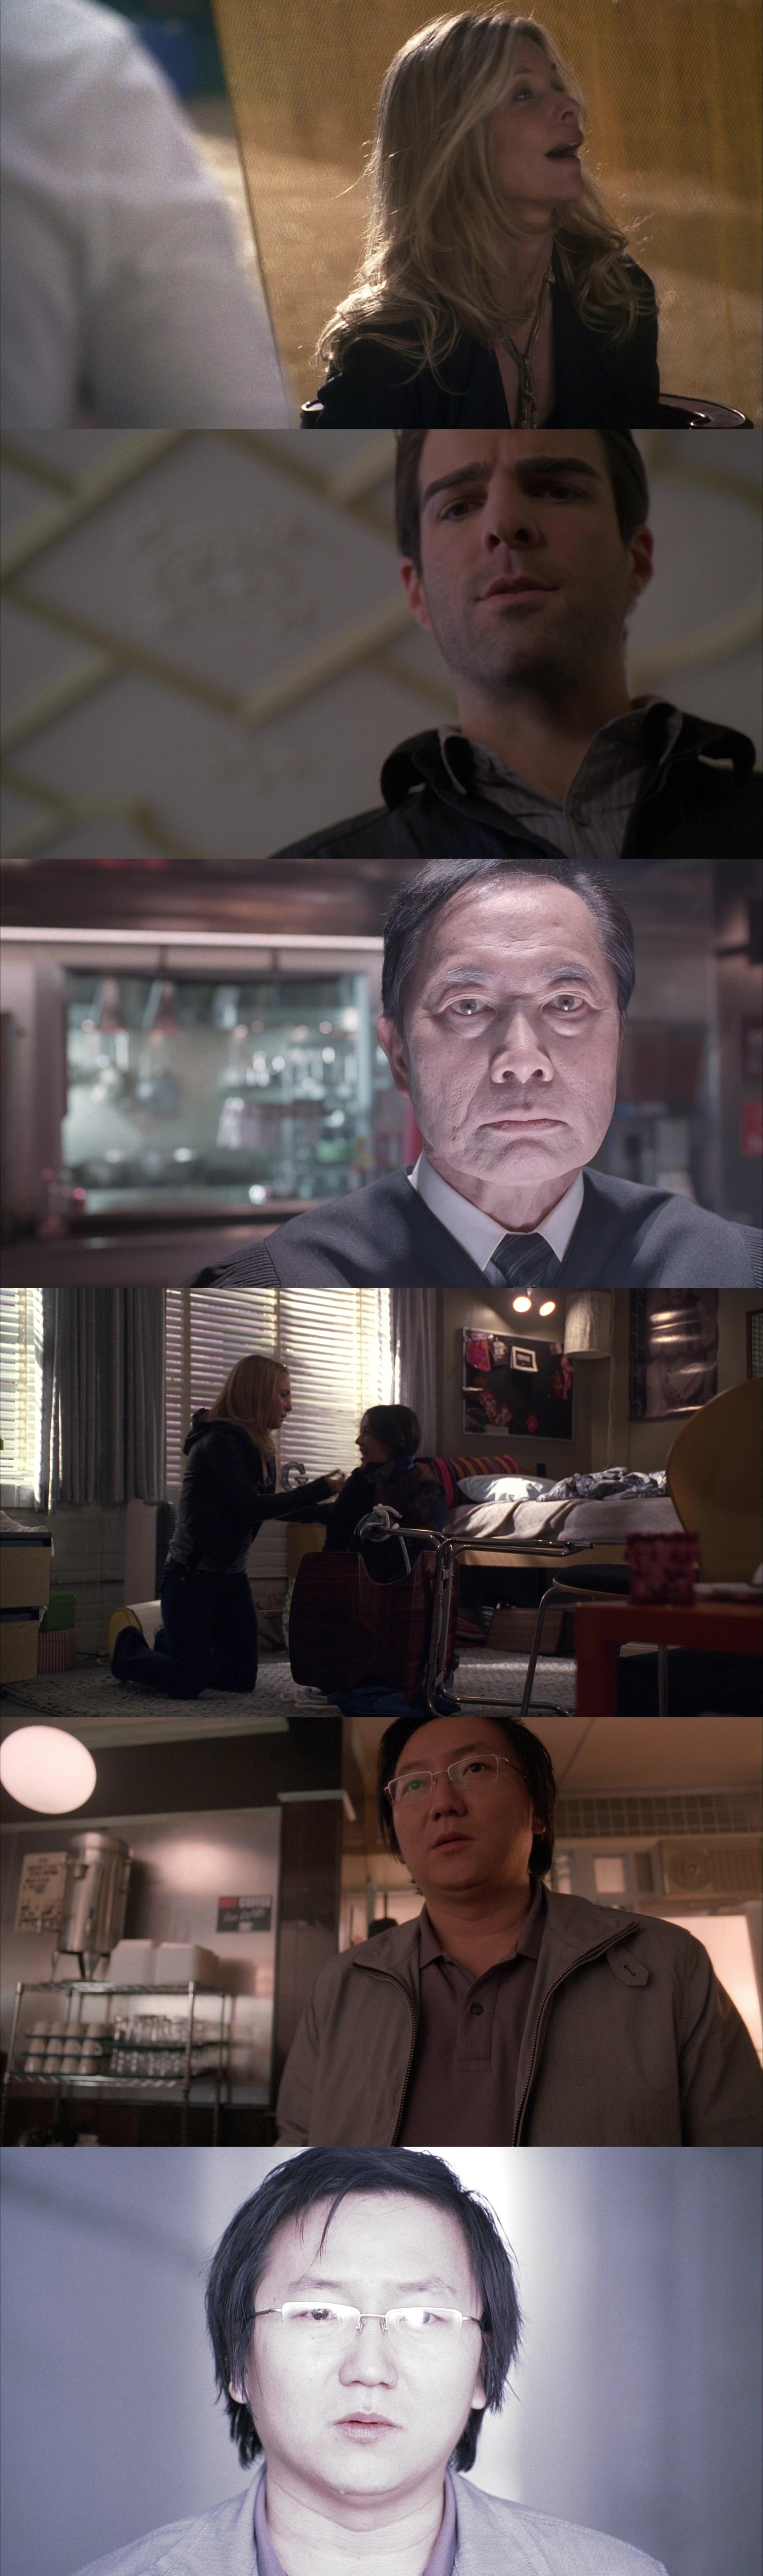 Heroes S04E16 MULTi 1080p BluRay x264-UKDTV